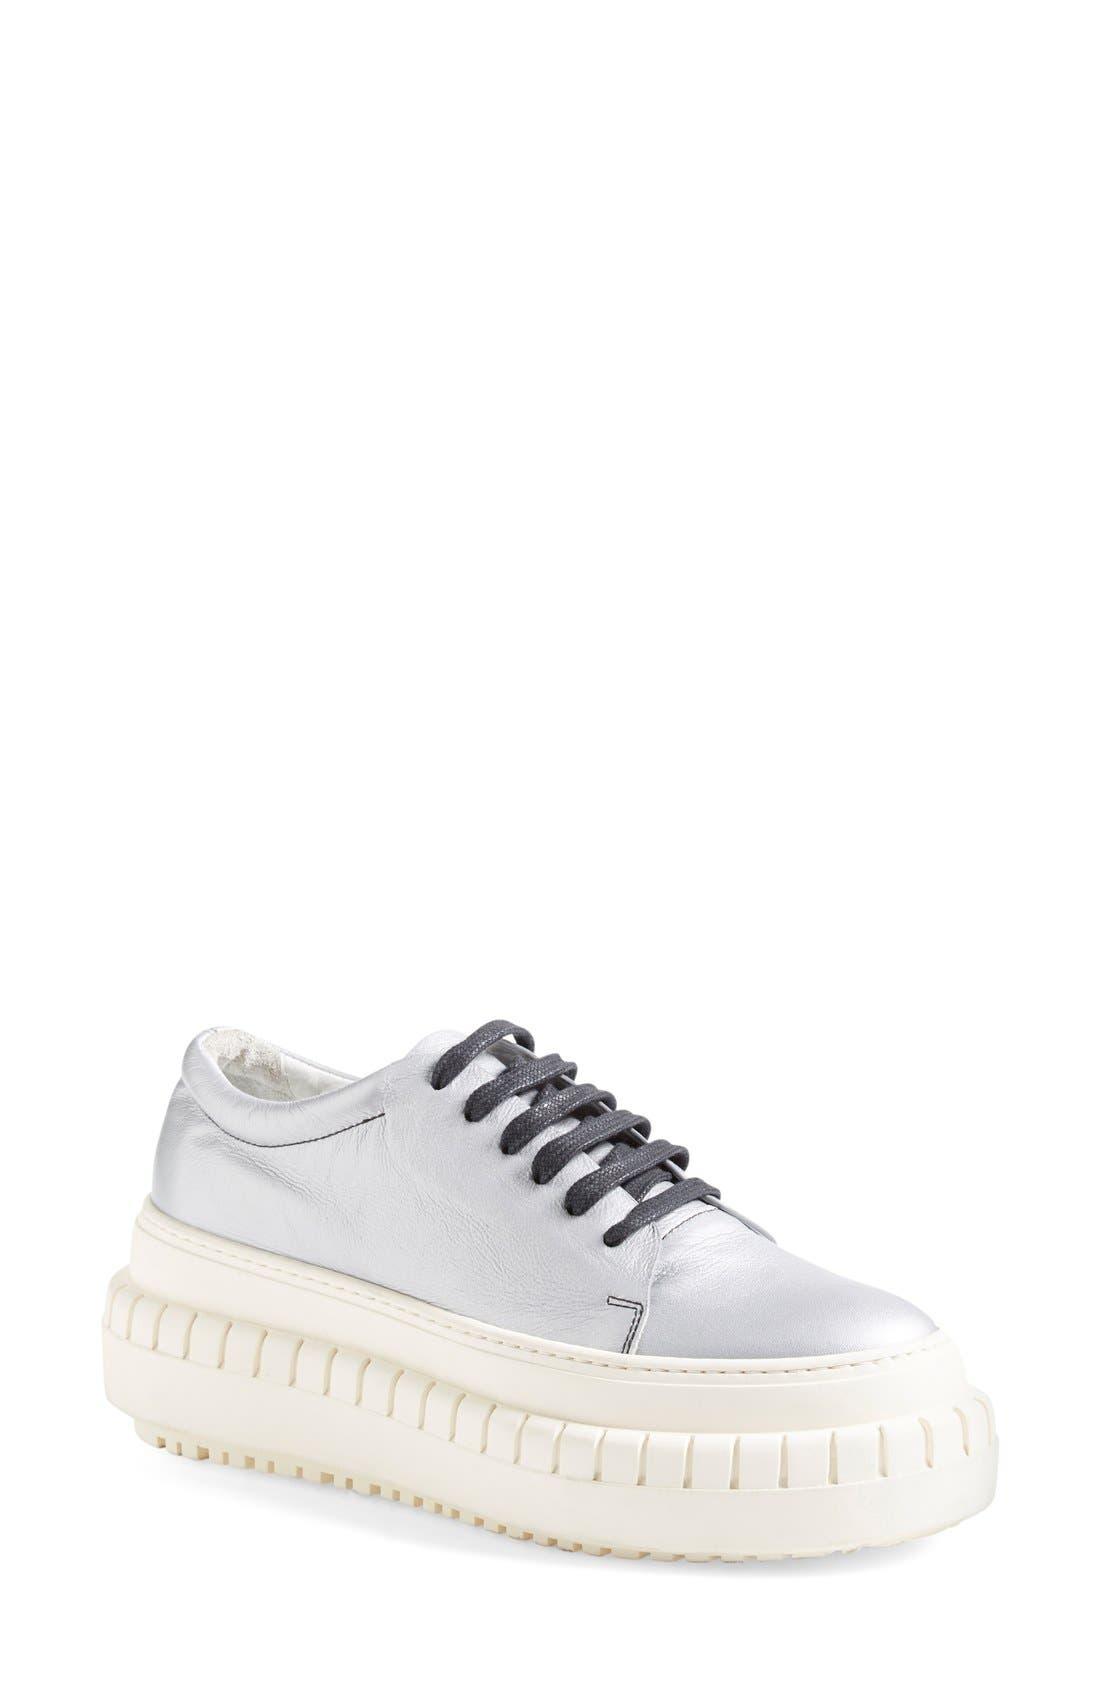 ACNE STUDIOS ACNE Studio 'Saddy' Platform Sneaker, Main, color, 040